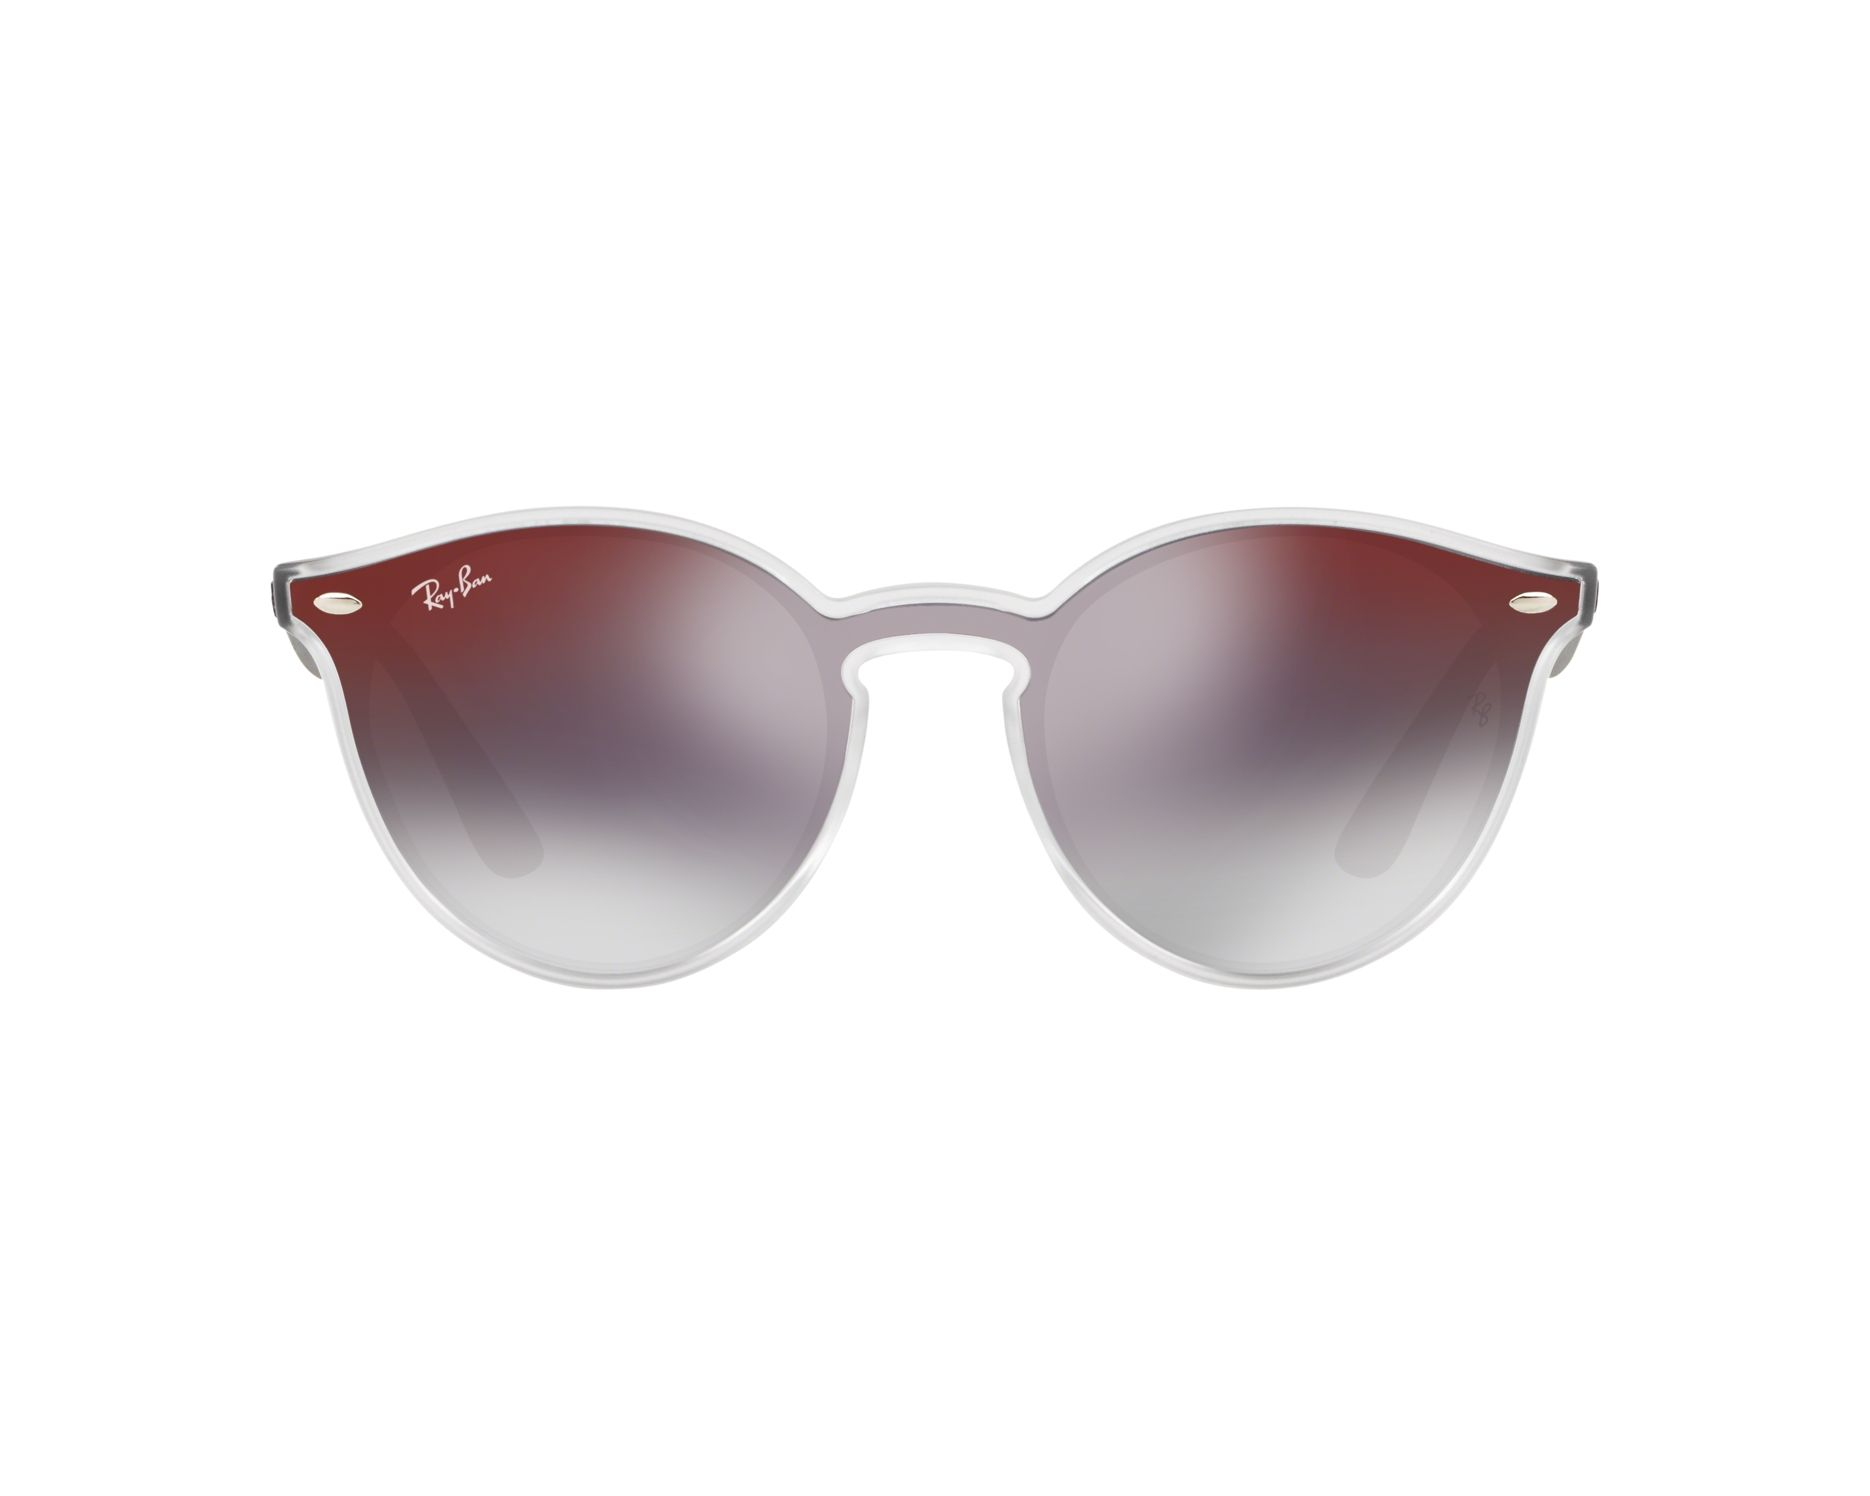 638f4fe942 Sunglasses Ray-Ban RB-4380-N 6355U0 55-18 Crystal Black 360